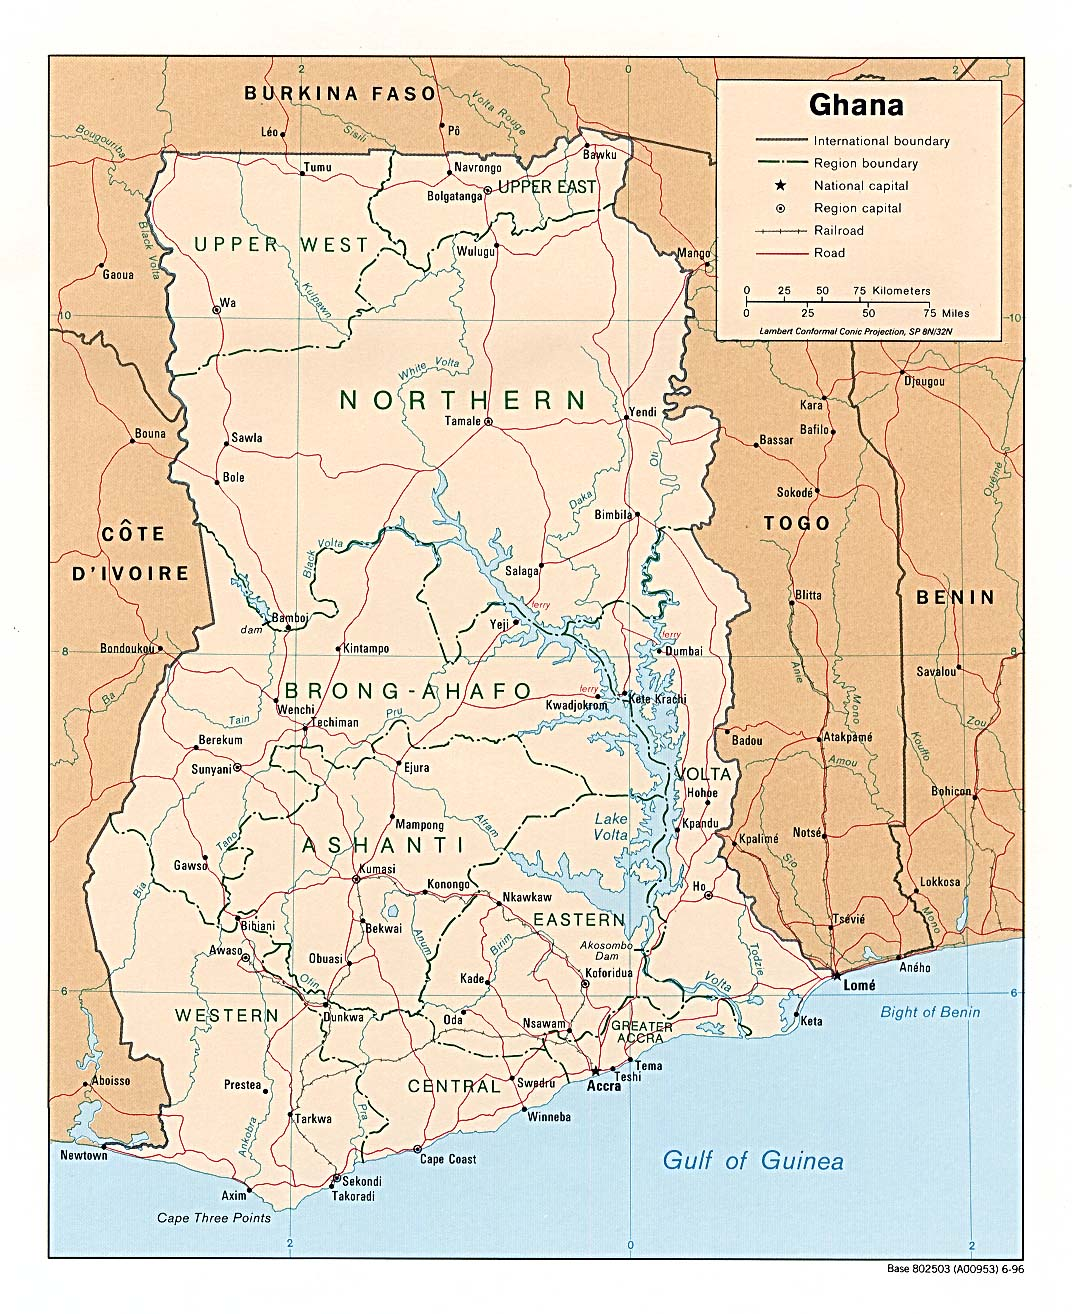 Download free ghana maps.